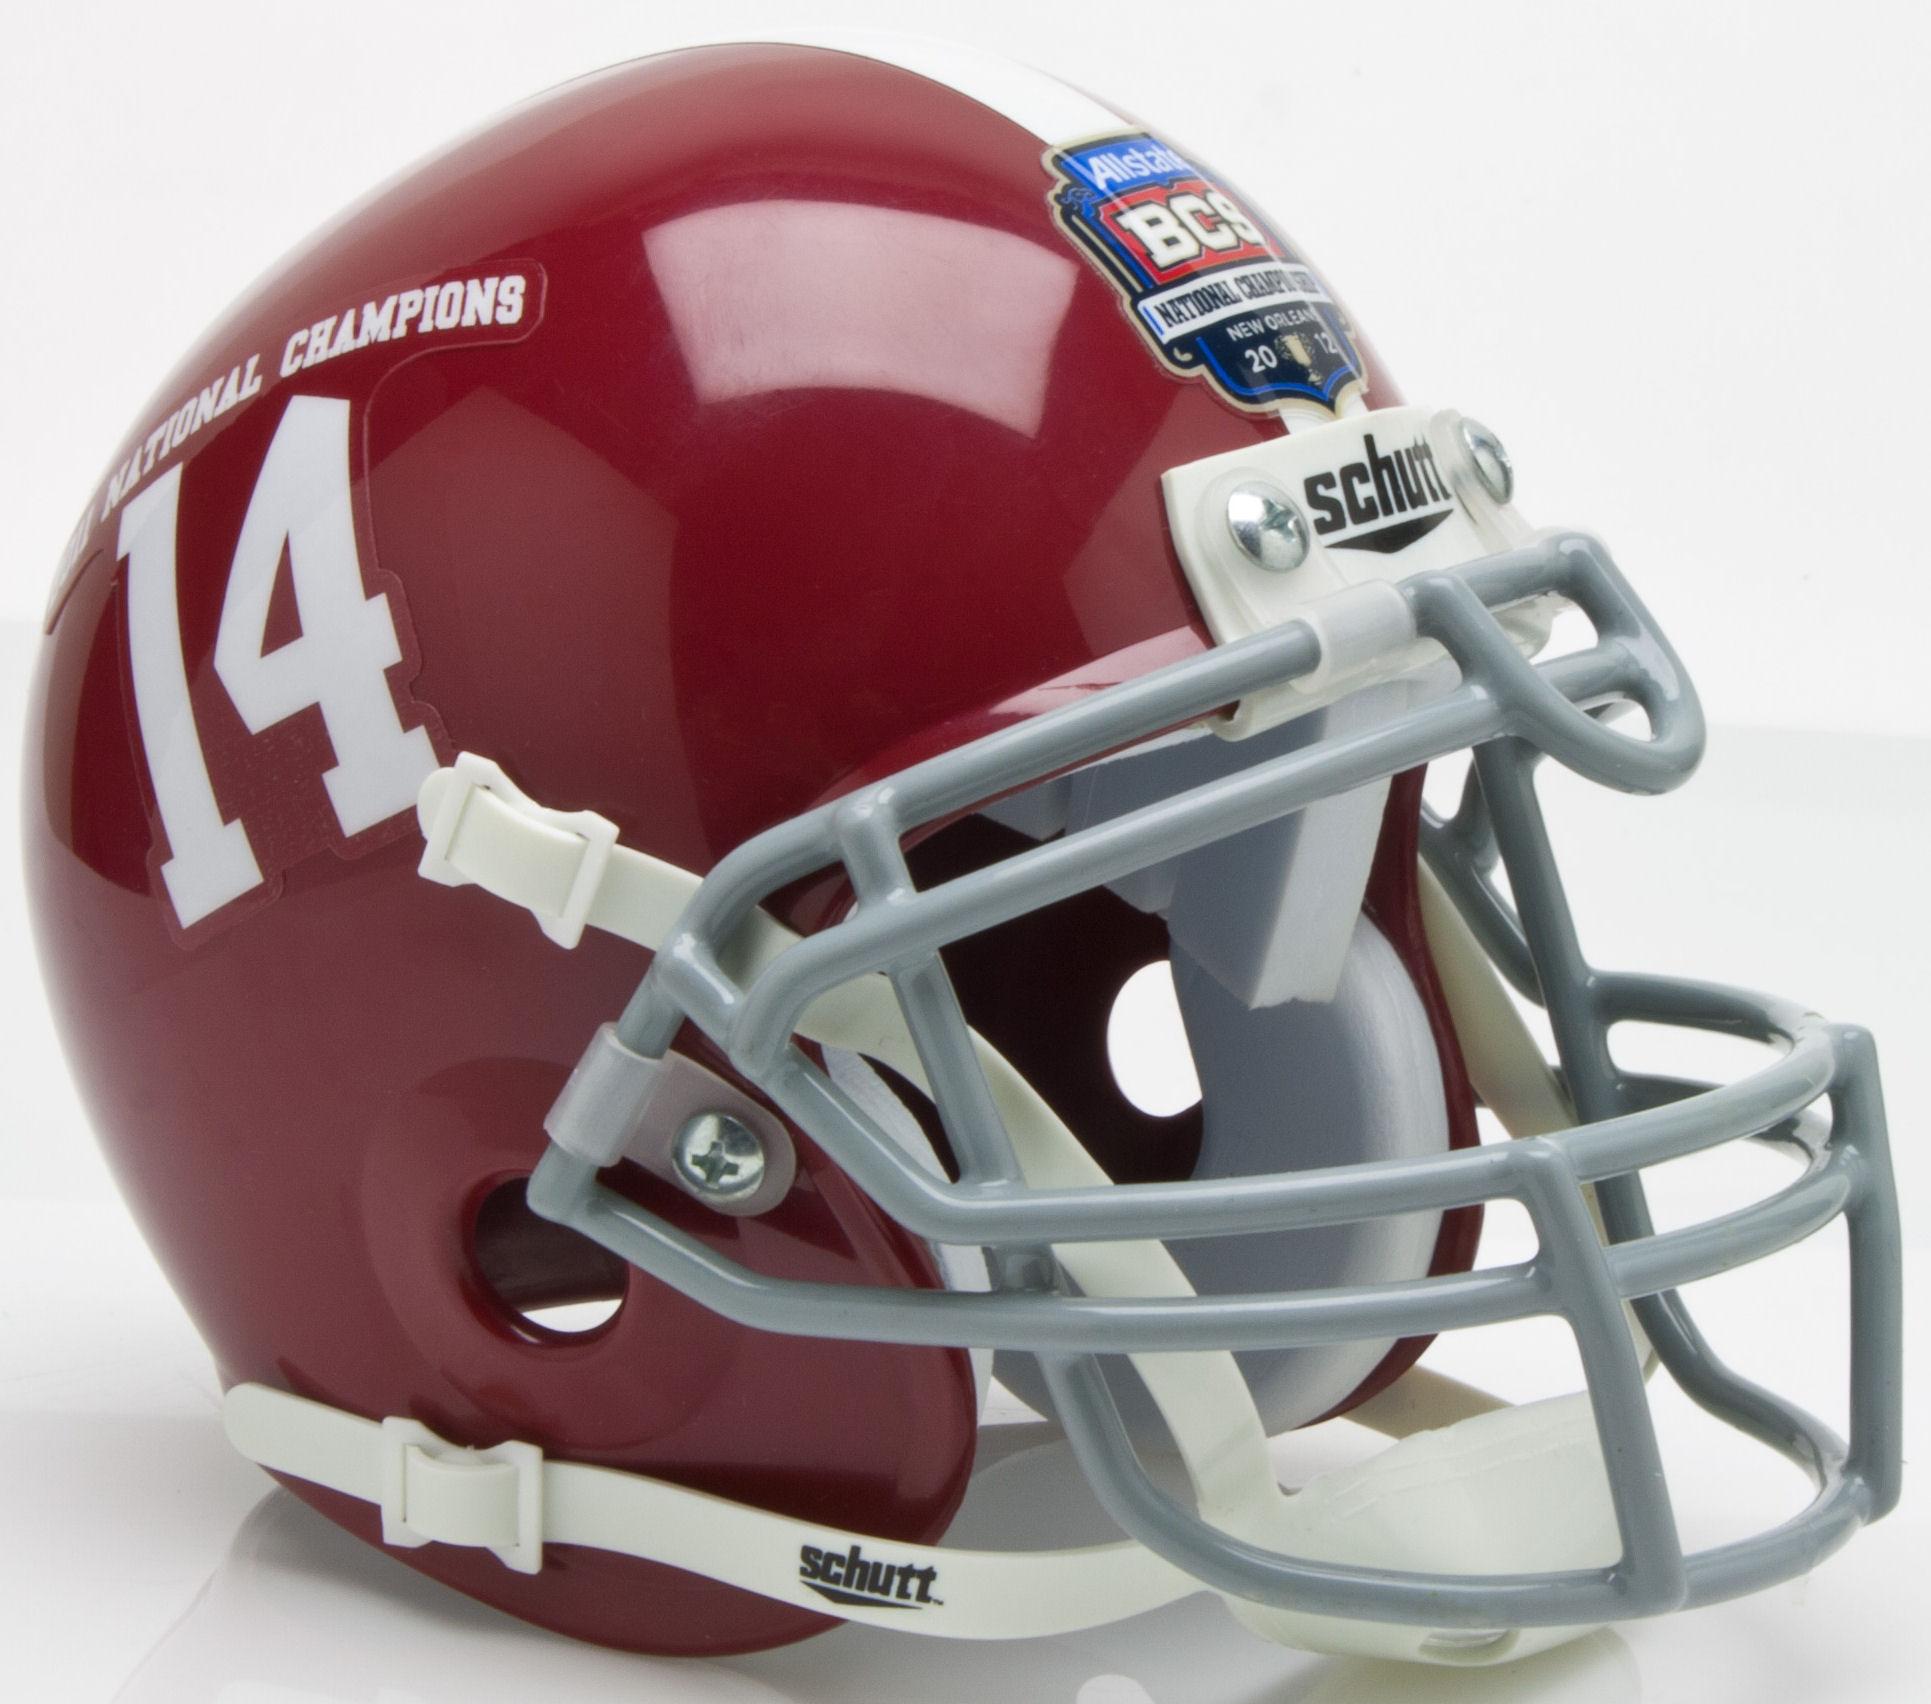 Alabama Crimson Tide 2011 Bcs National Champions Mini Xp Authentic Helmet Schutt In 2021 Alabama Crimson Tide Alabama Crimson Football Helmets